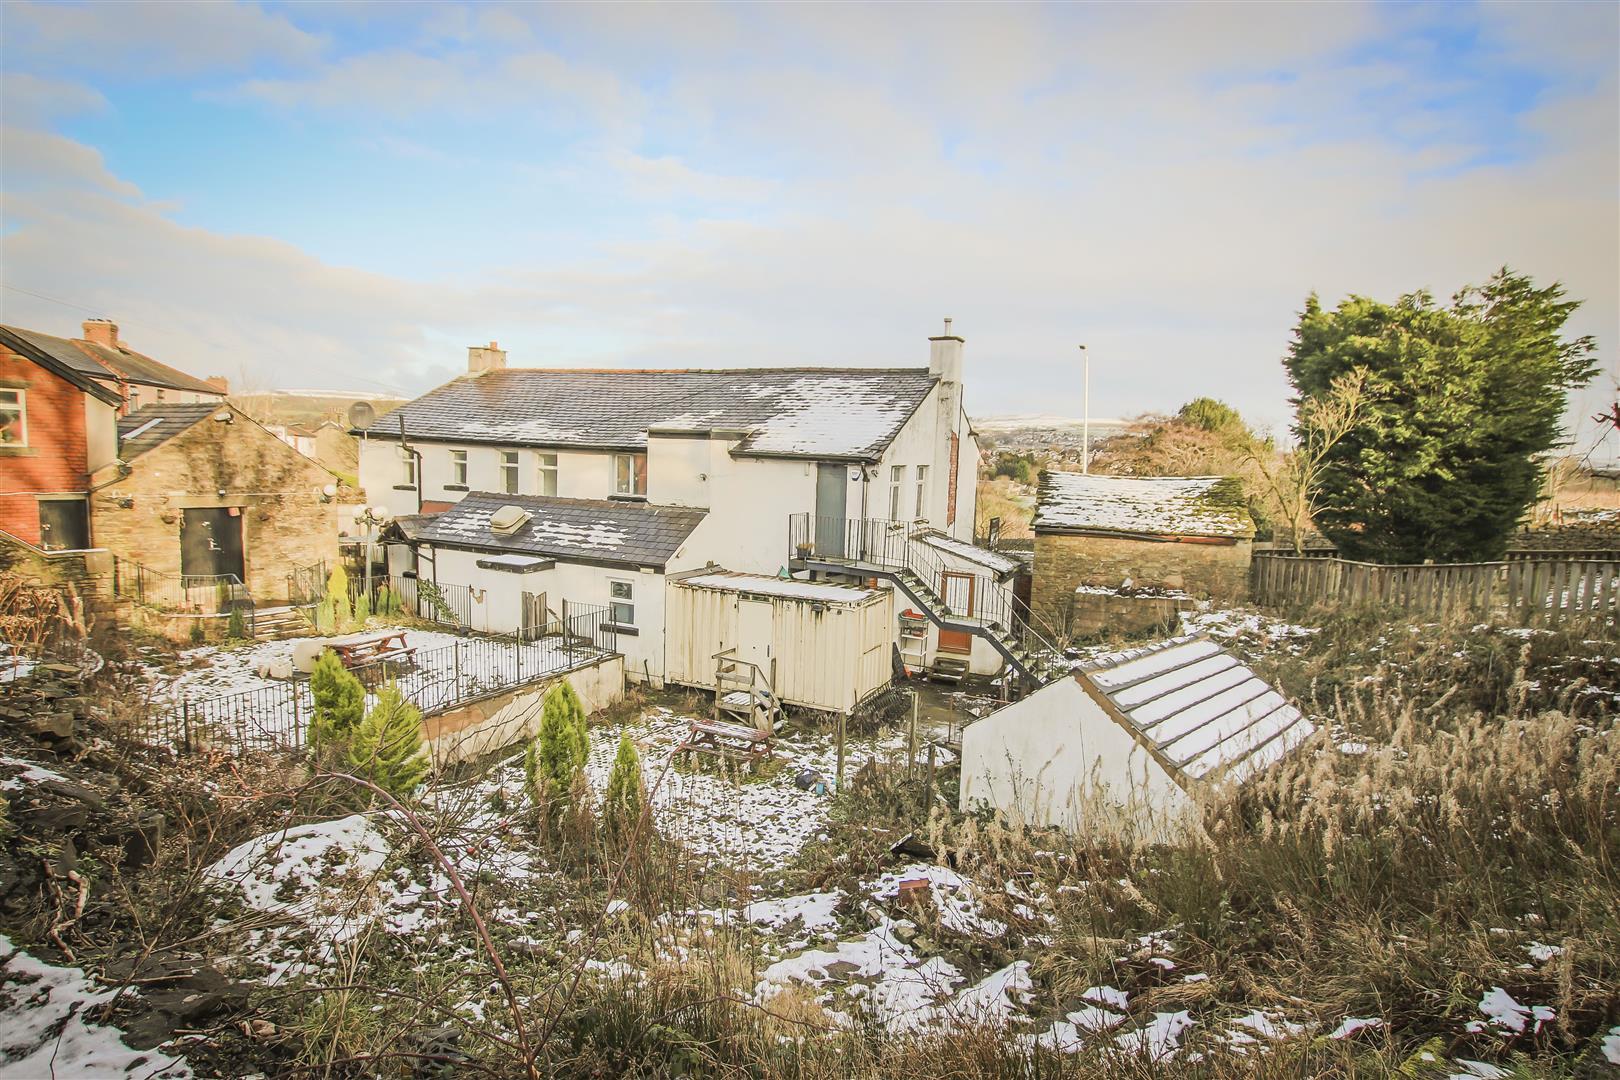 Development Site Land For Sale - Image 2